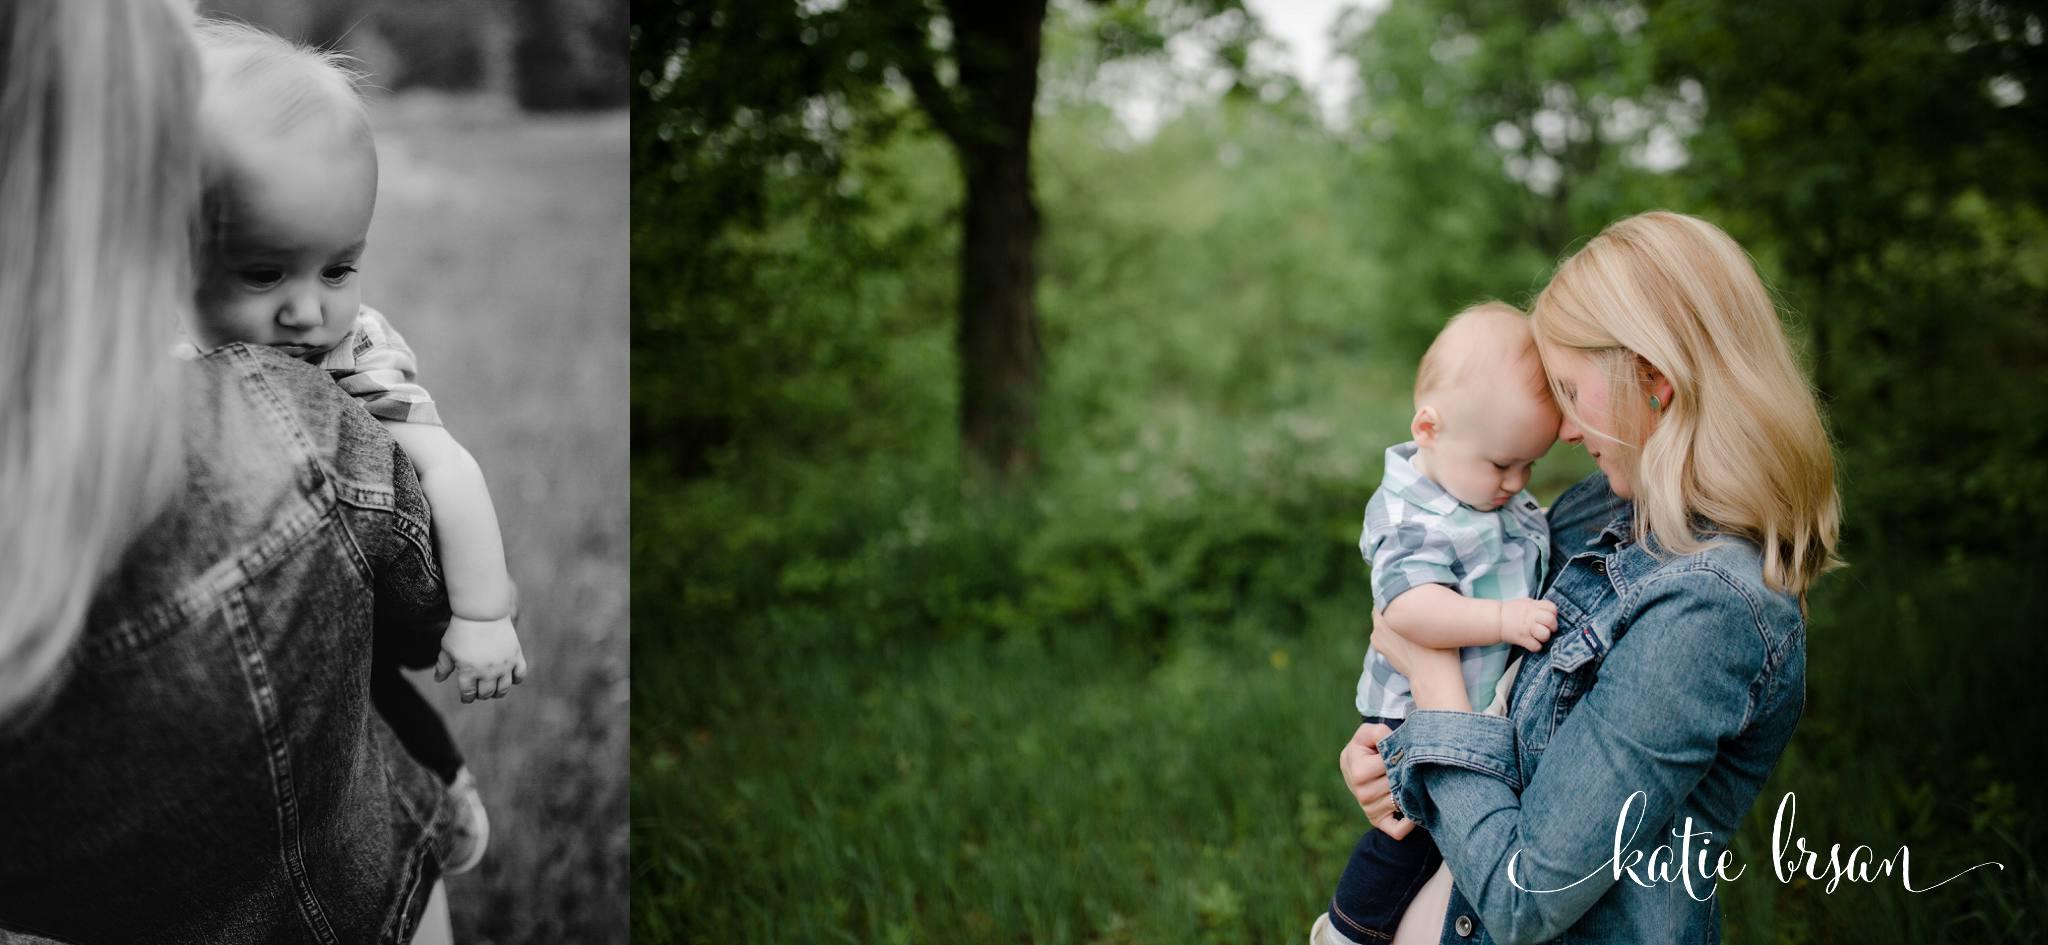 Mokena_FamilyPhotographer_9month_milestone_session_1470.jpg